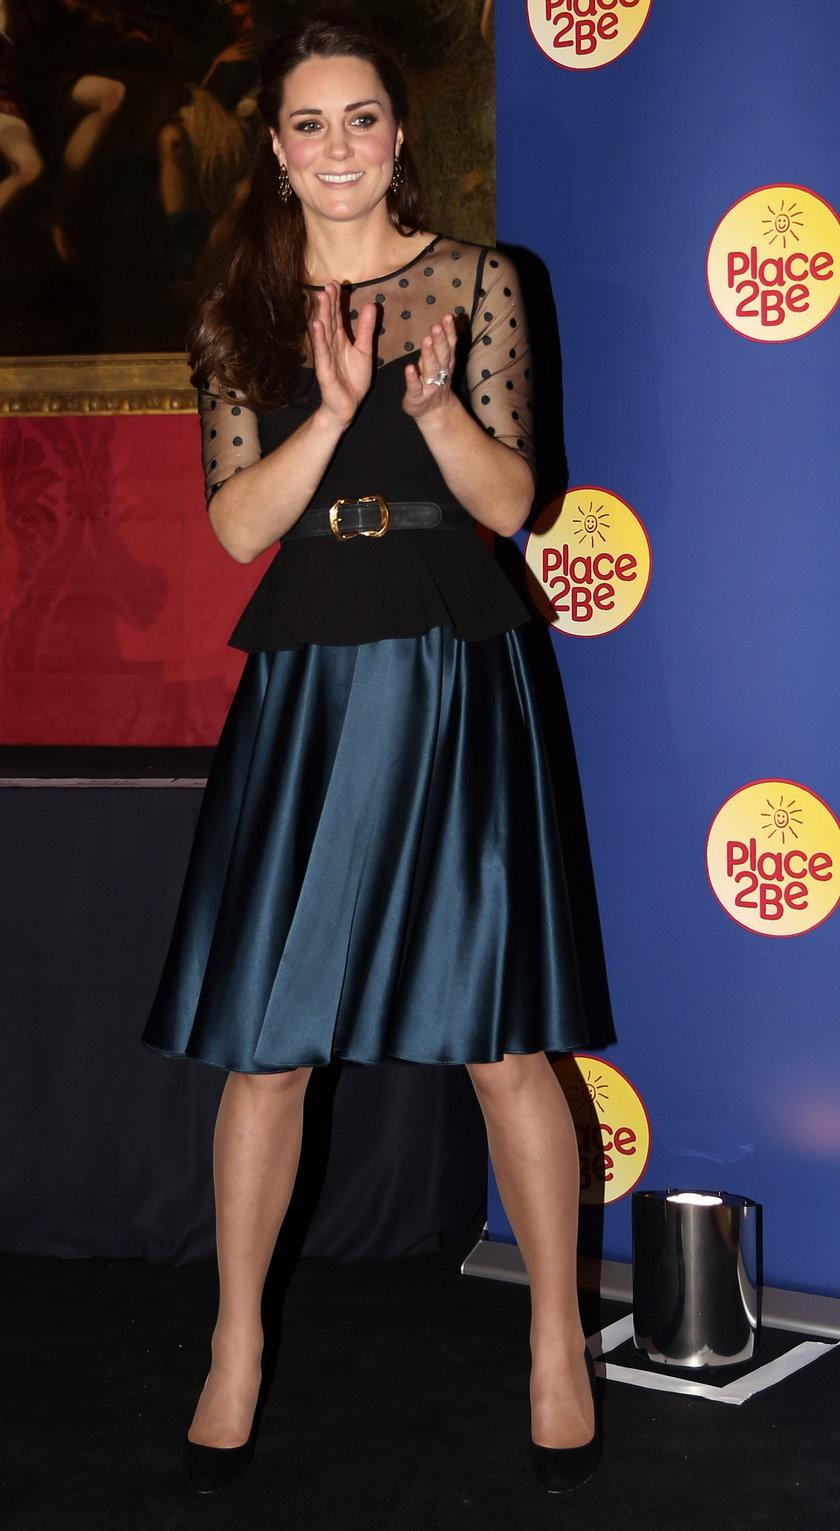 Księżna Kate w czarnej koronce